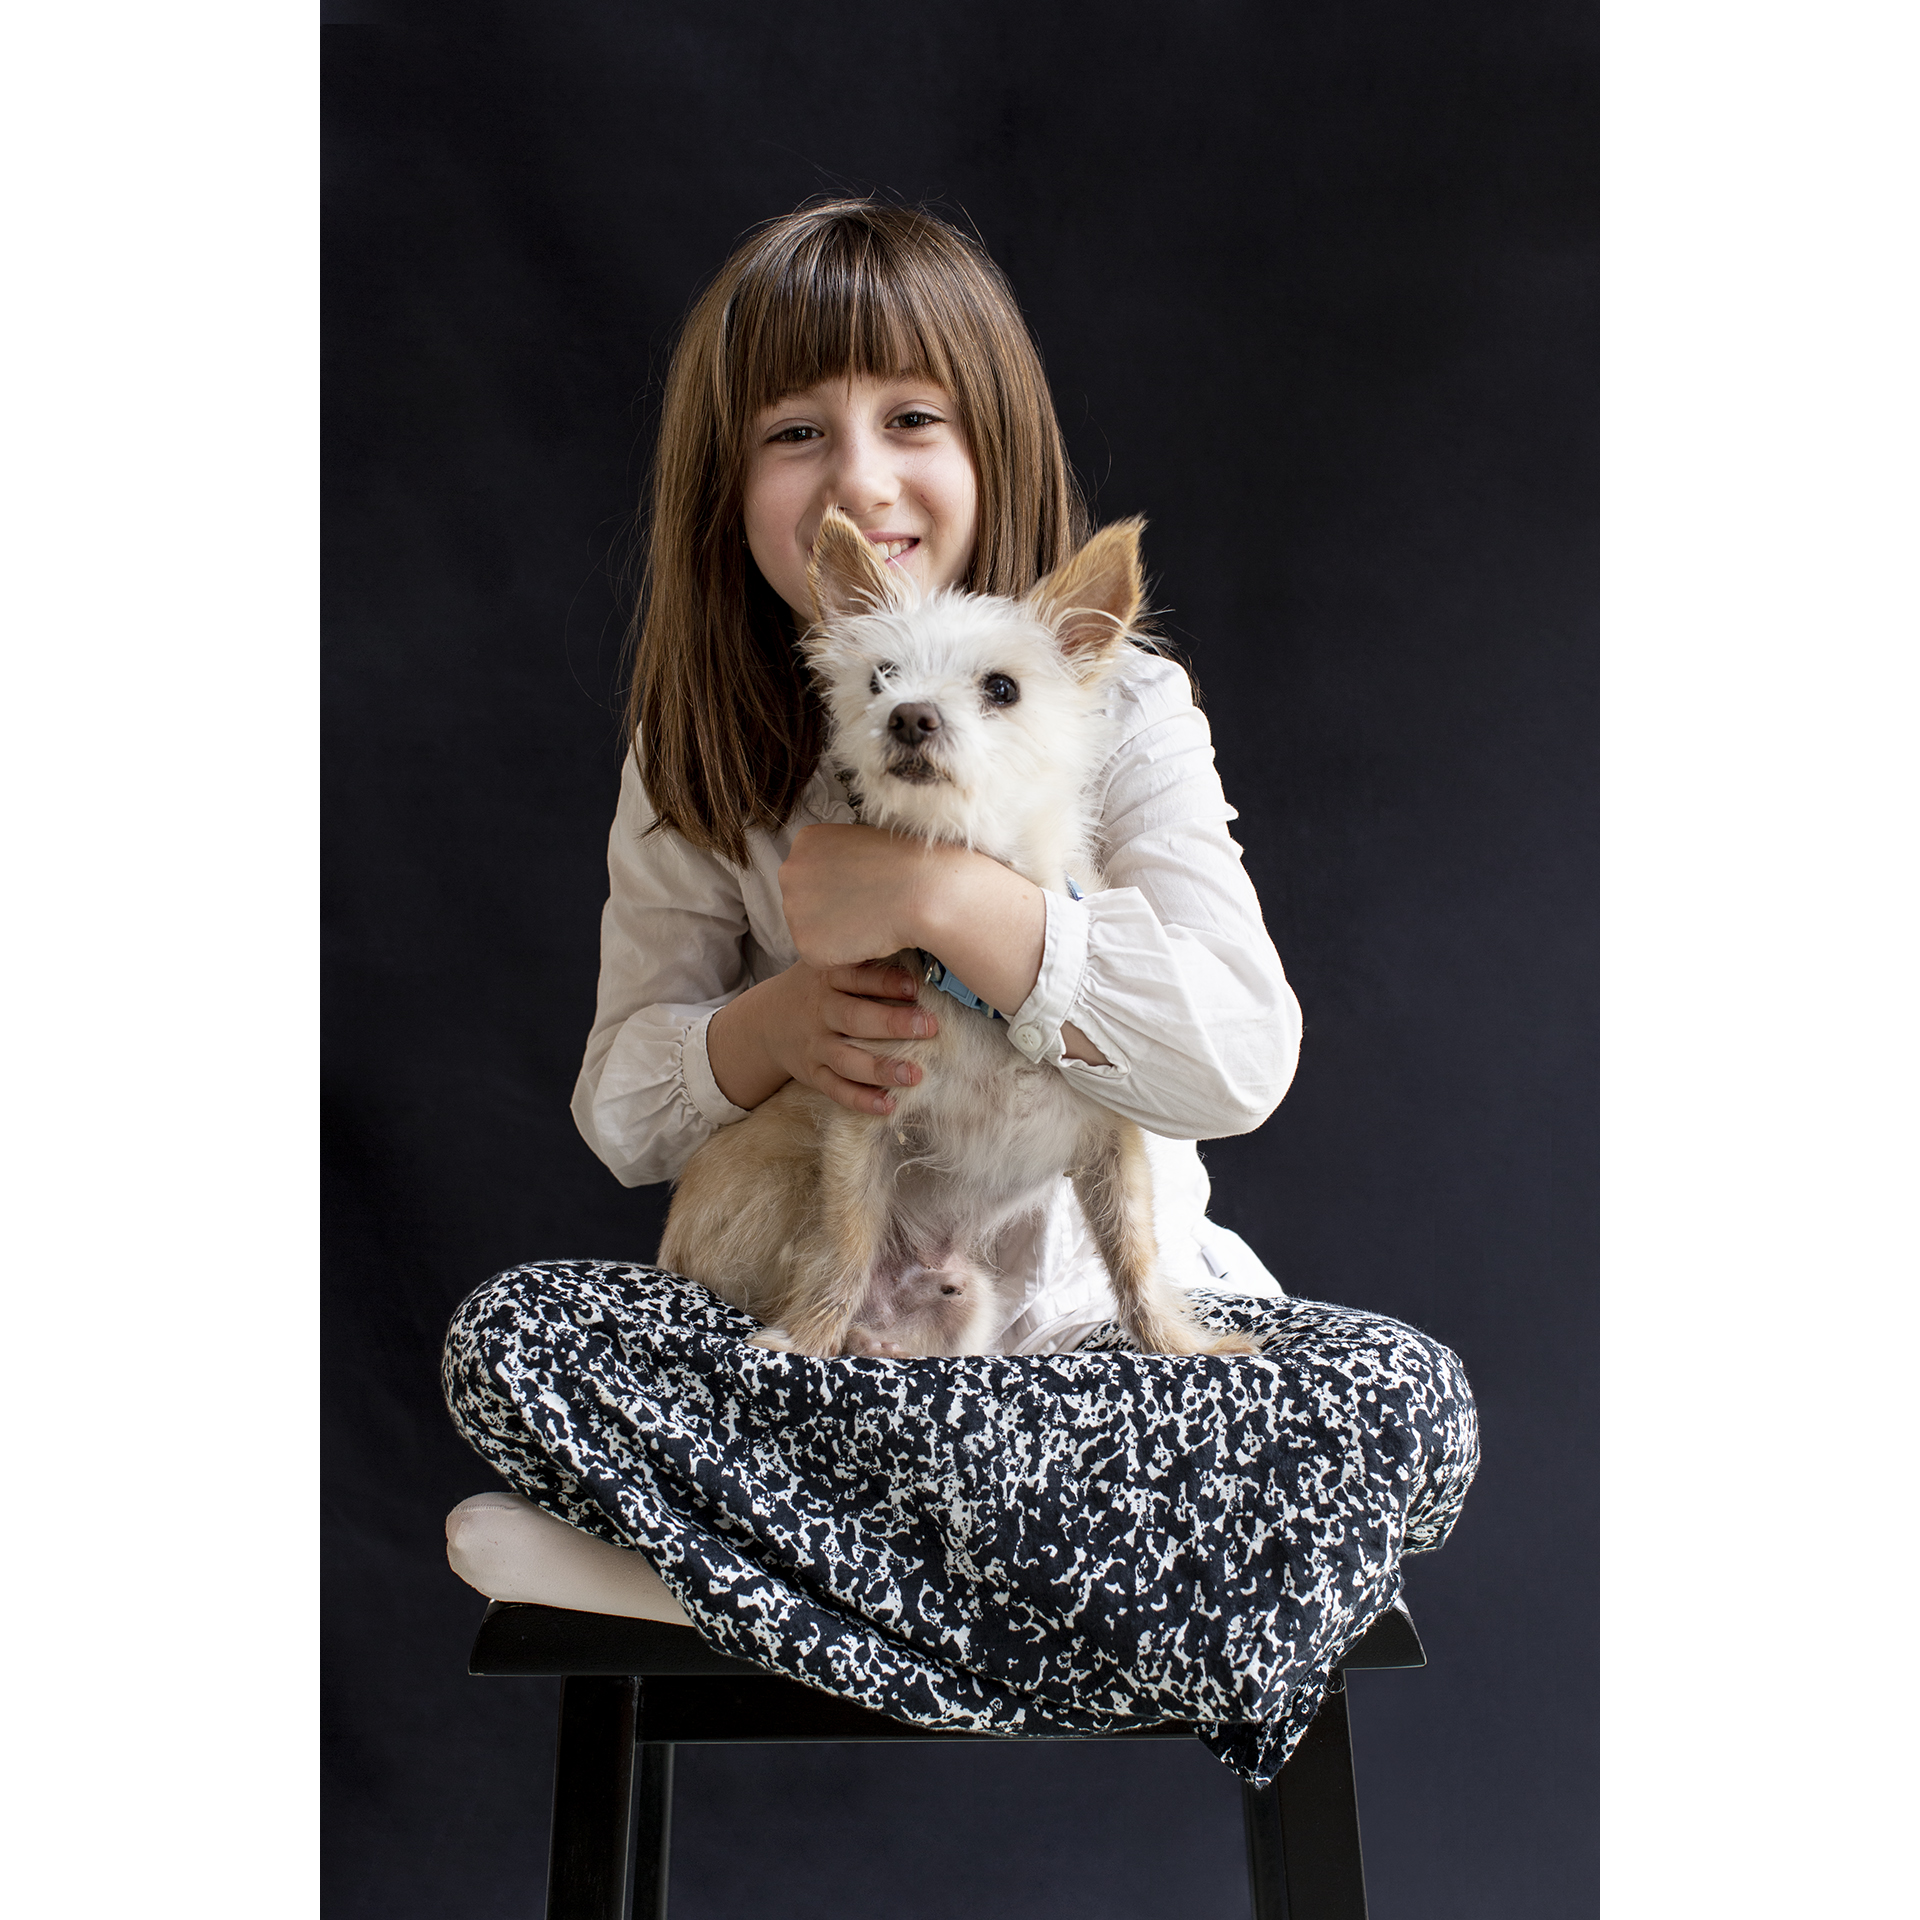 Ella Fleur (age 7), with her dog Zumbido, Maine Portrait by Lori Pedrick